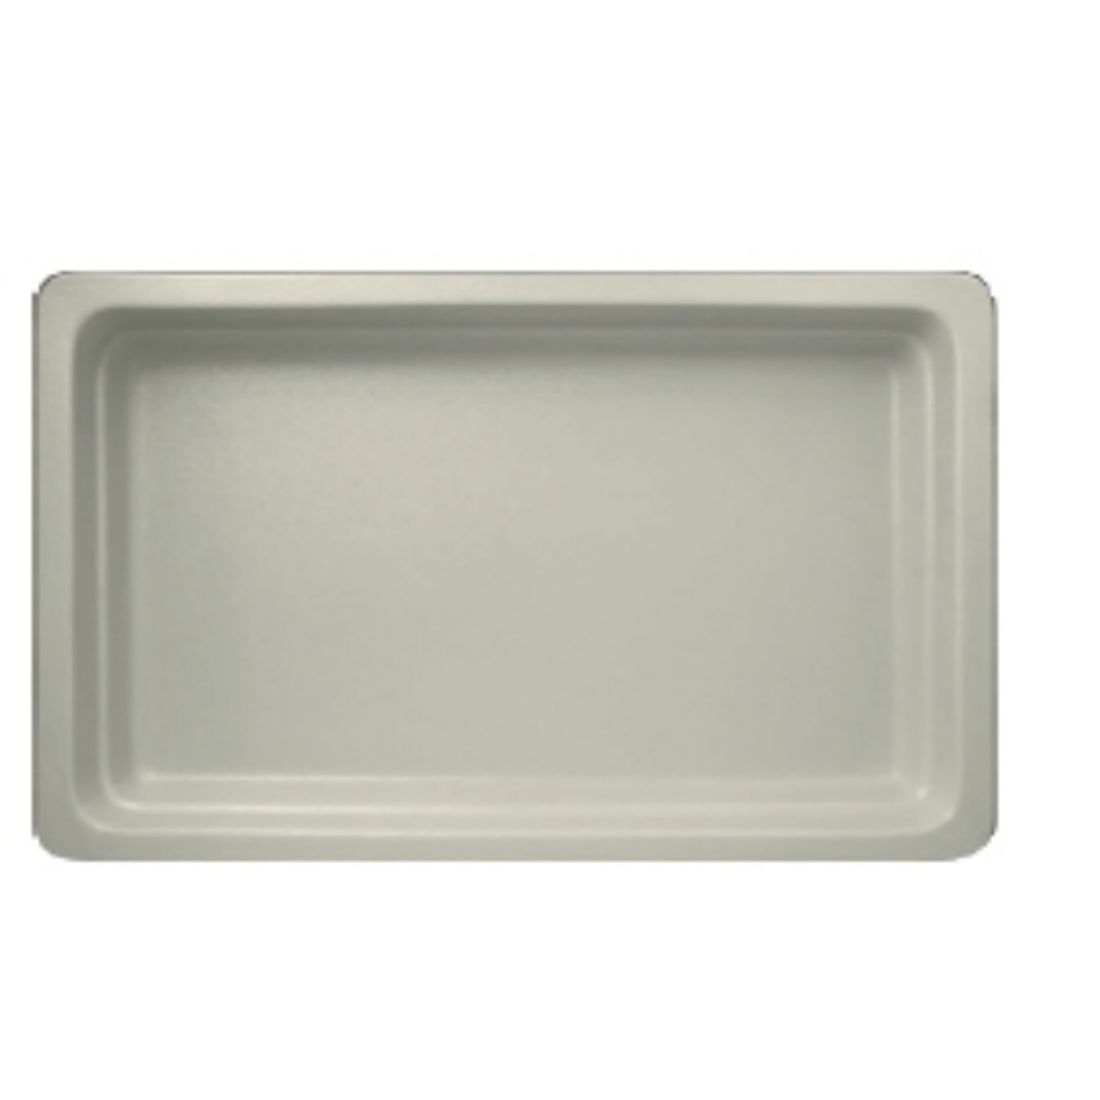 Gastronádoba porcelánová Neofusion GN 1/2 65 mm bílá mat